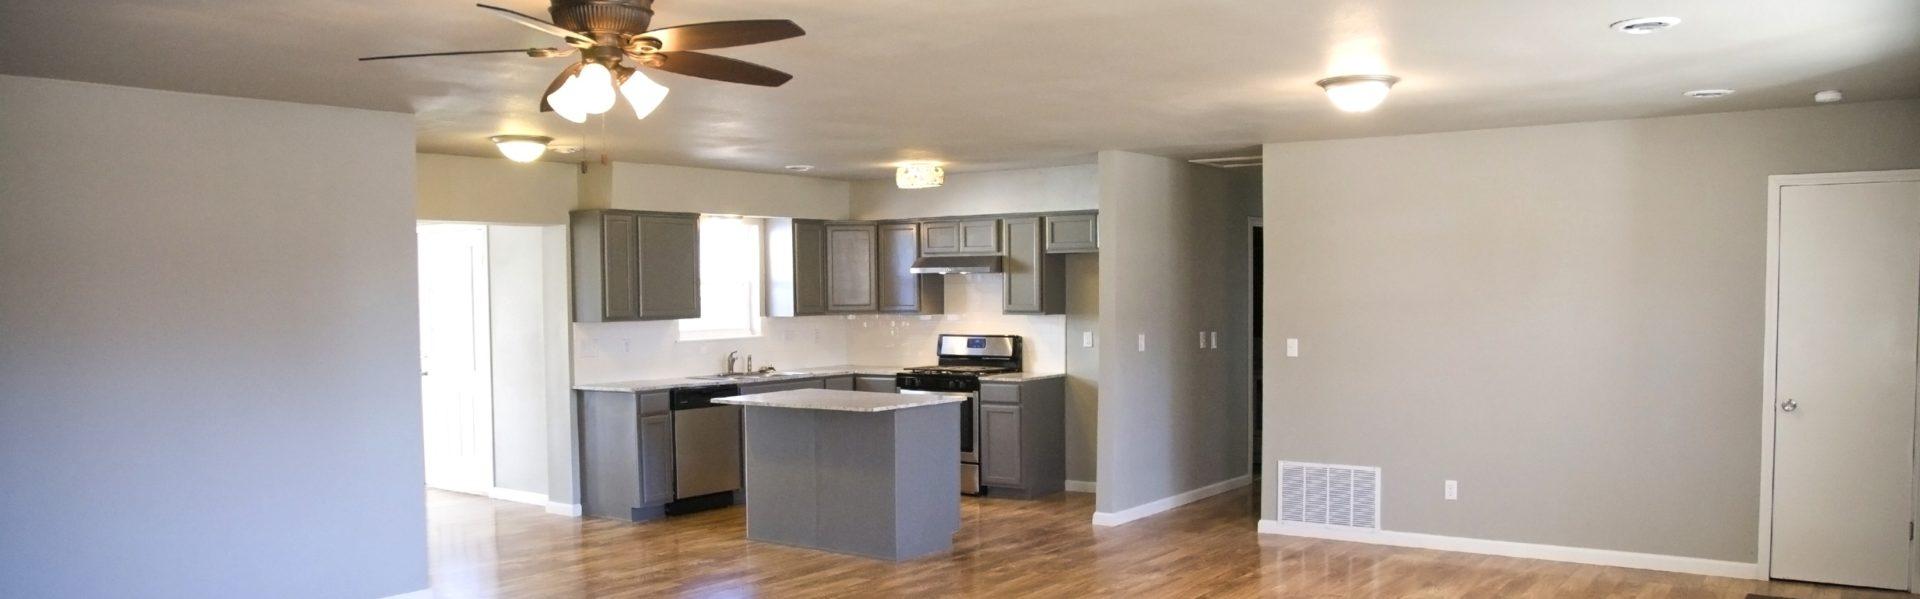 479 Properties, LLC